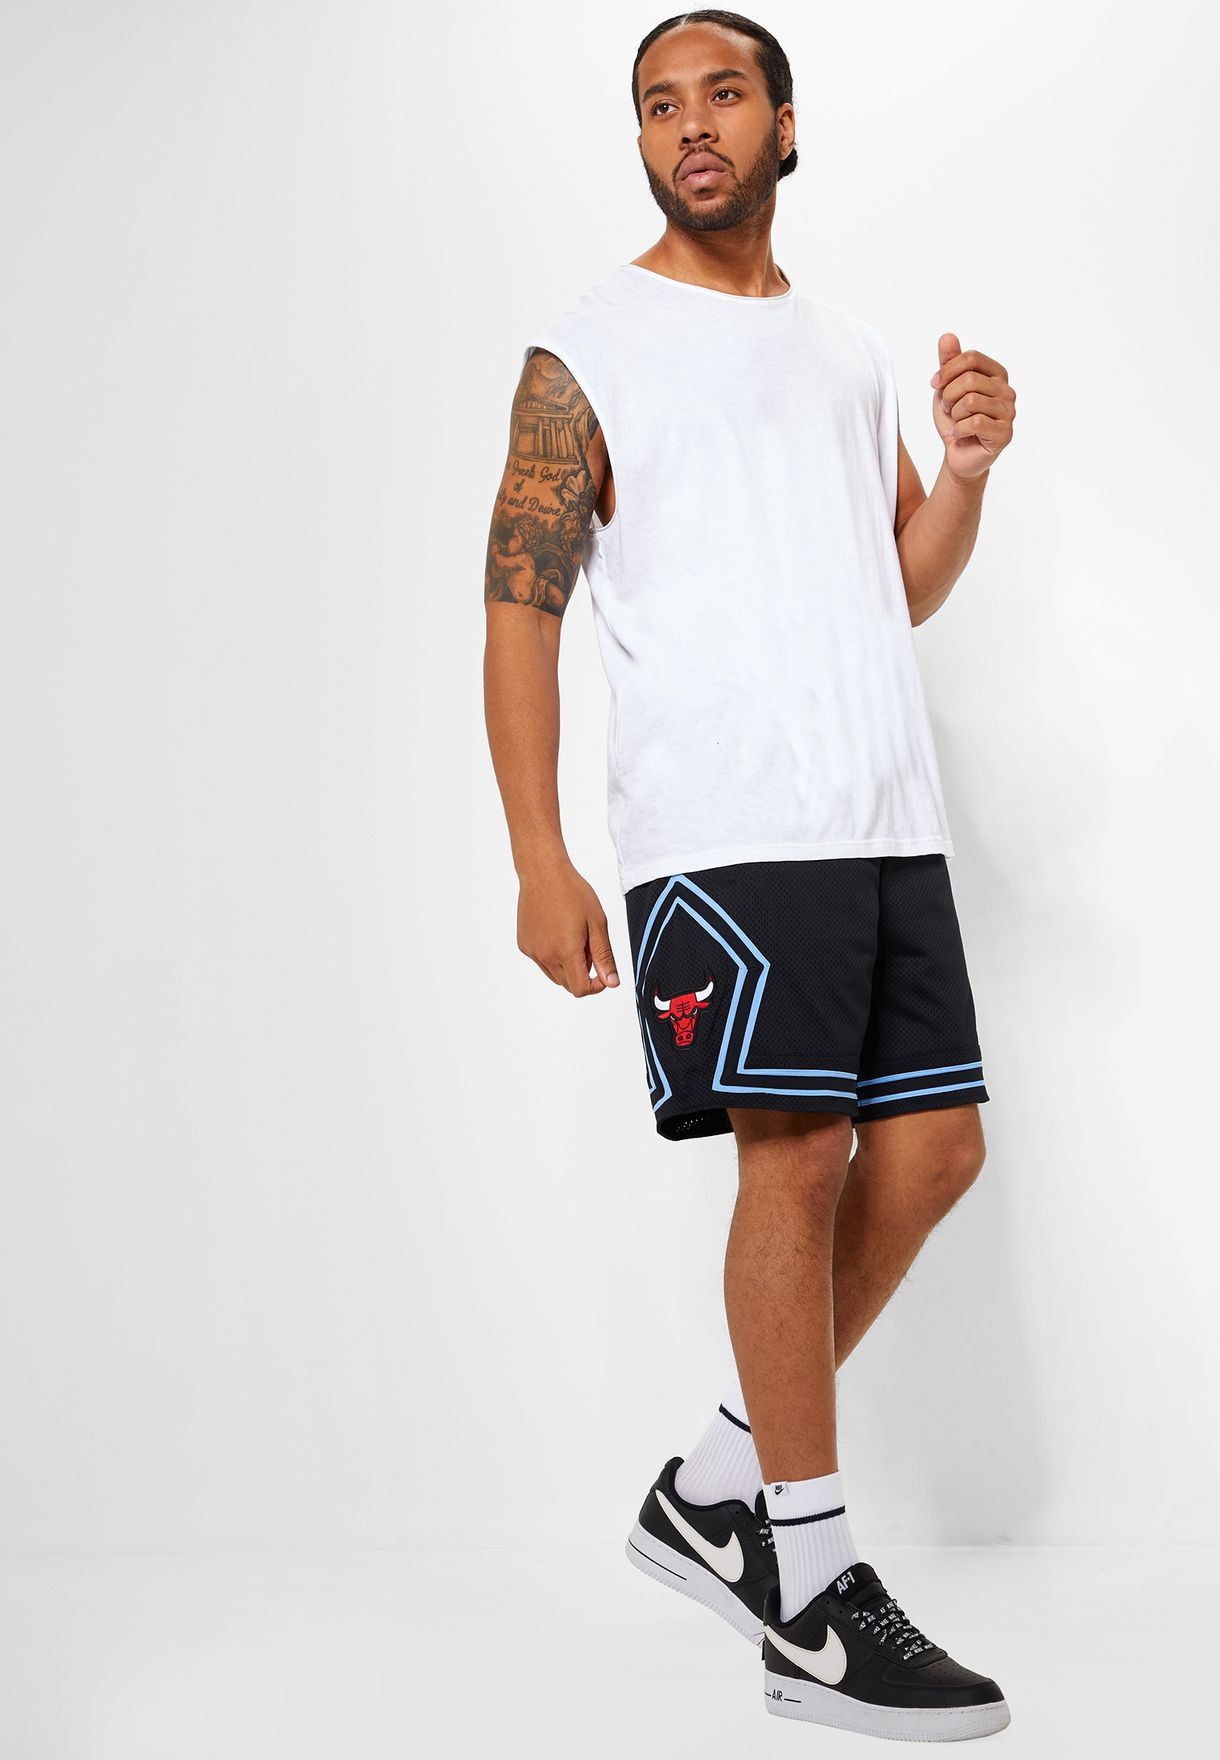 Dedos de los pies tanque embargo  Buy Nike black Chicago Bulls Courtside Shorts for Men in MENA, Worldwide |  930667-010